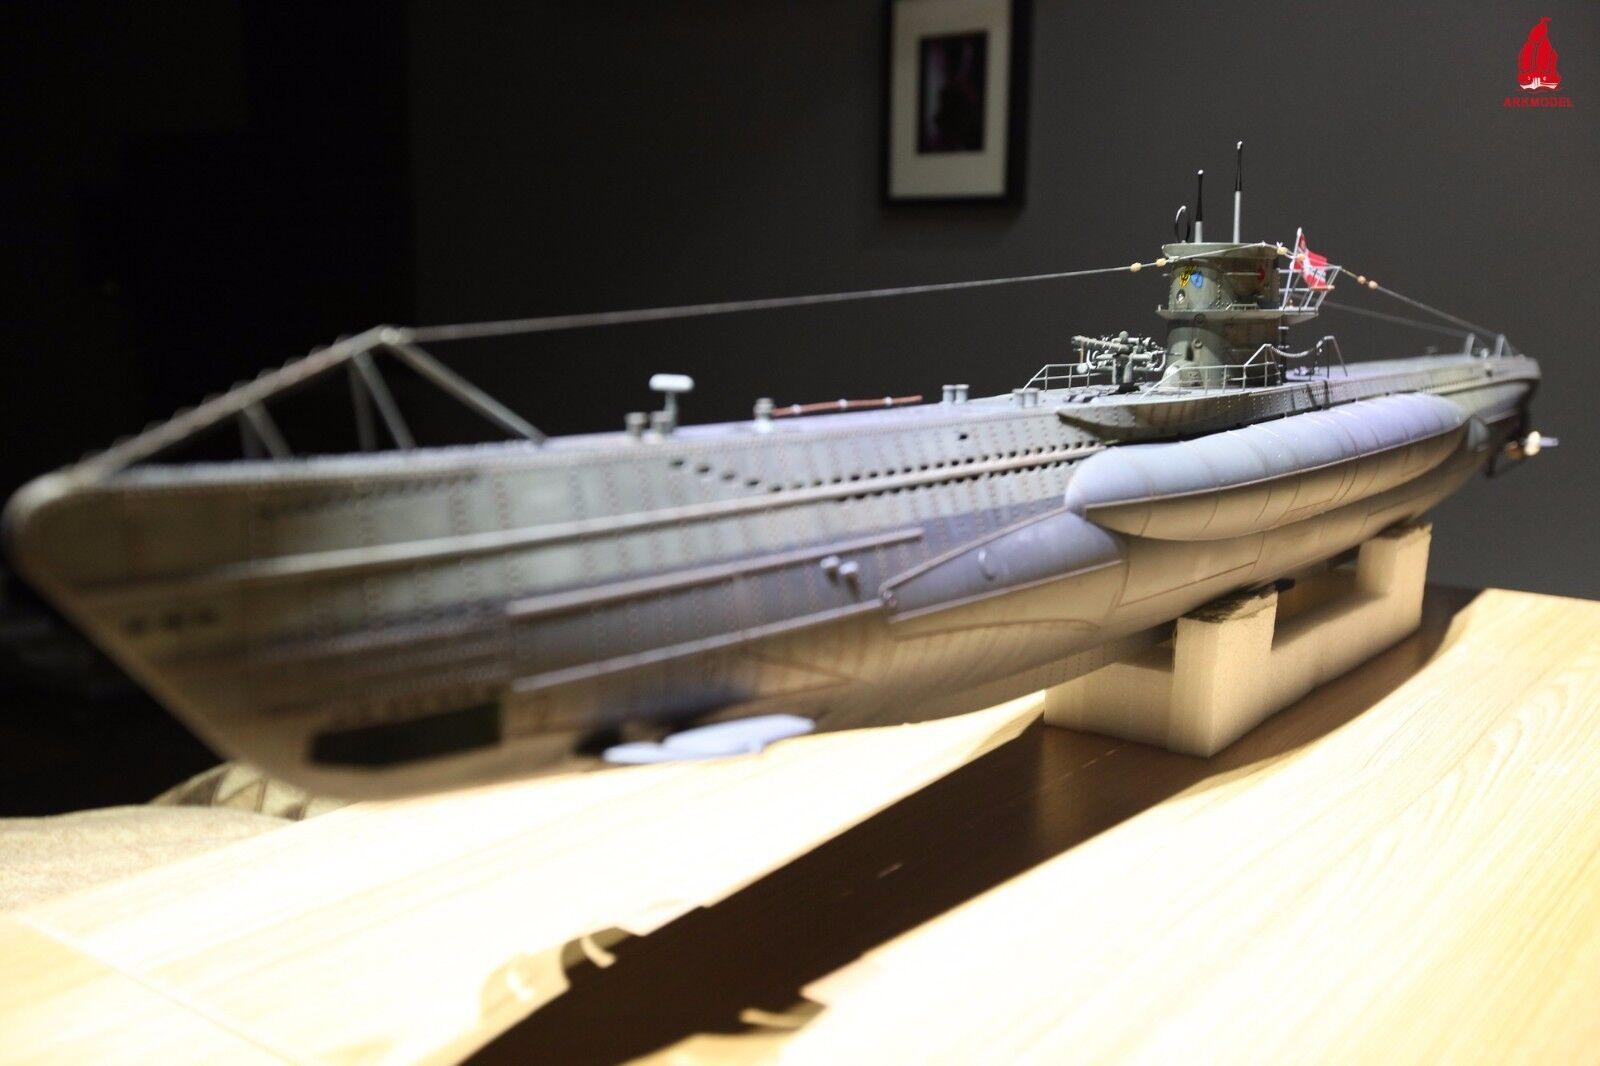 Arkmodel 1 48 VIIC KIT German U-Boat Type Boat Model Building RC Submarine Model